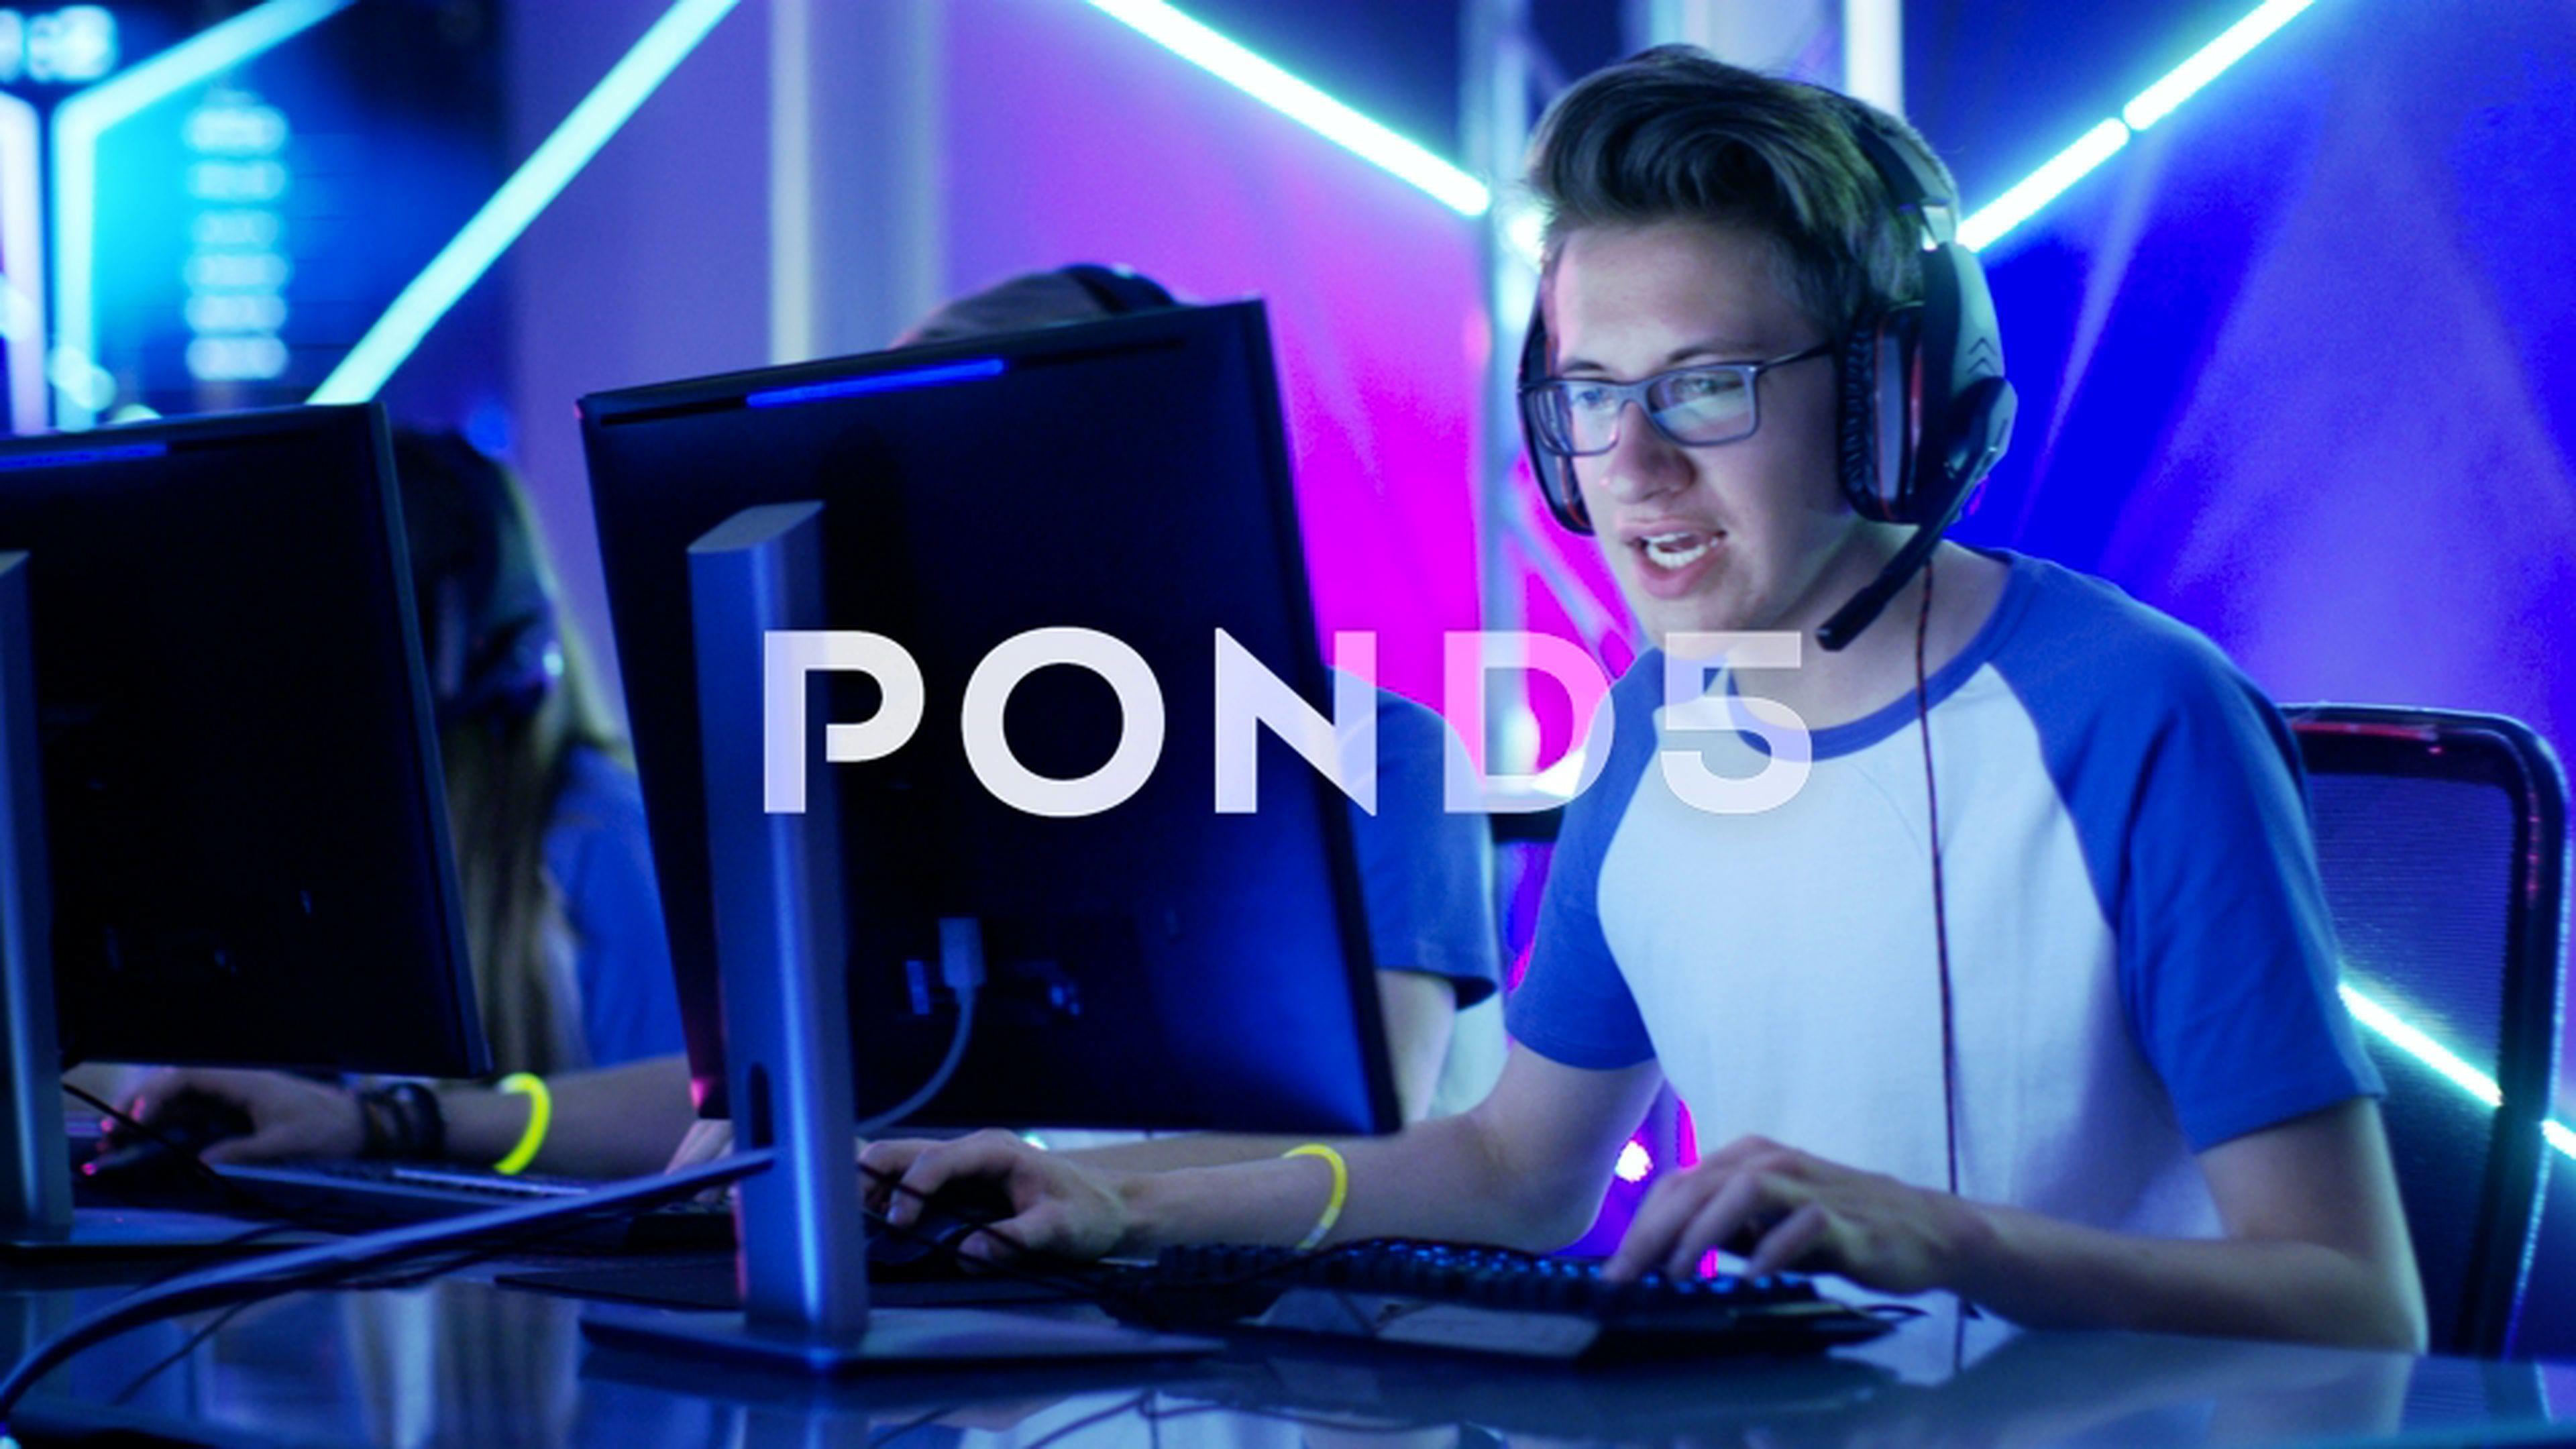 Team of Teenage Gamers Win Cafe Online Video